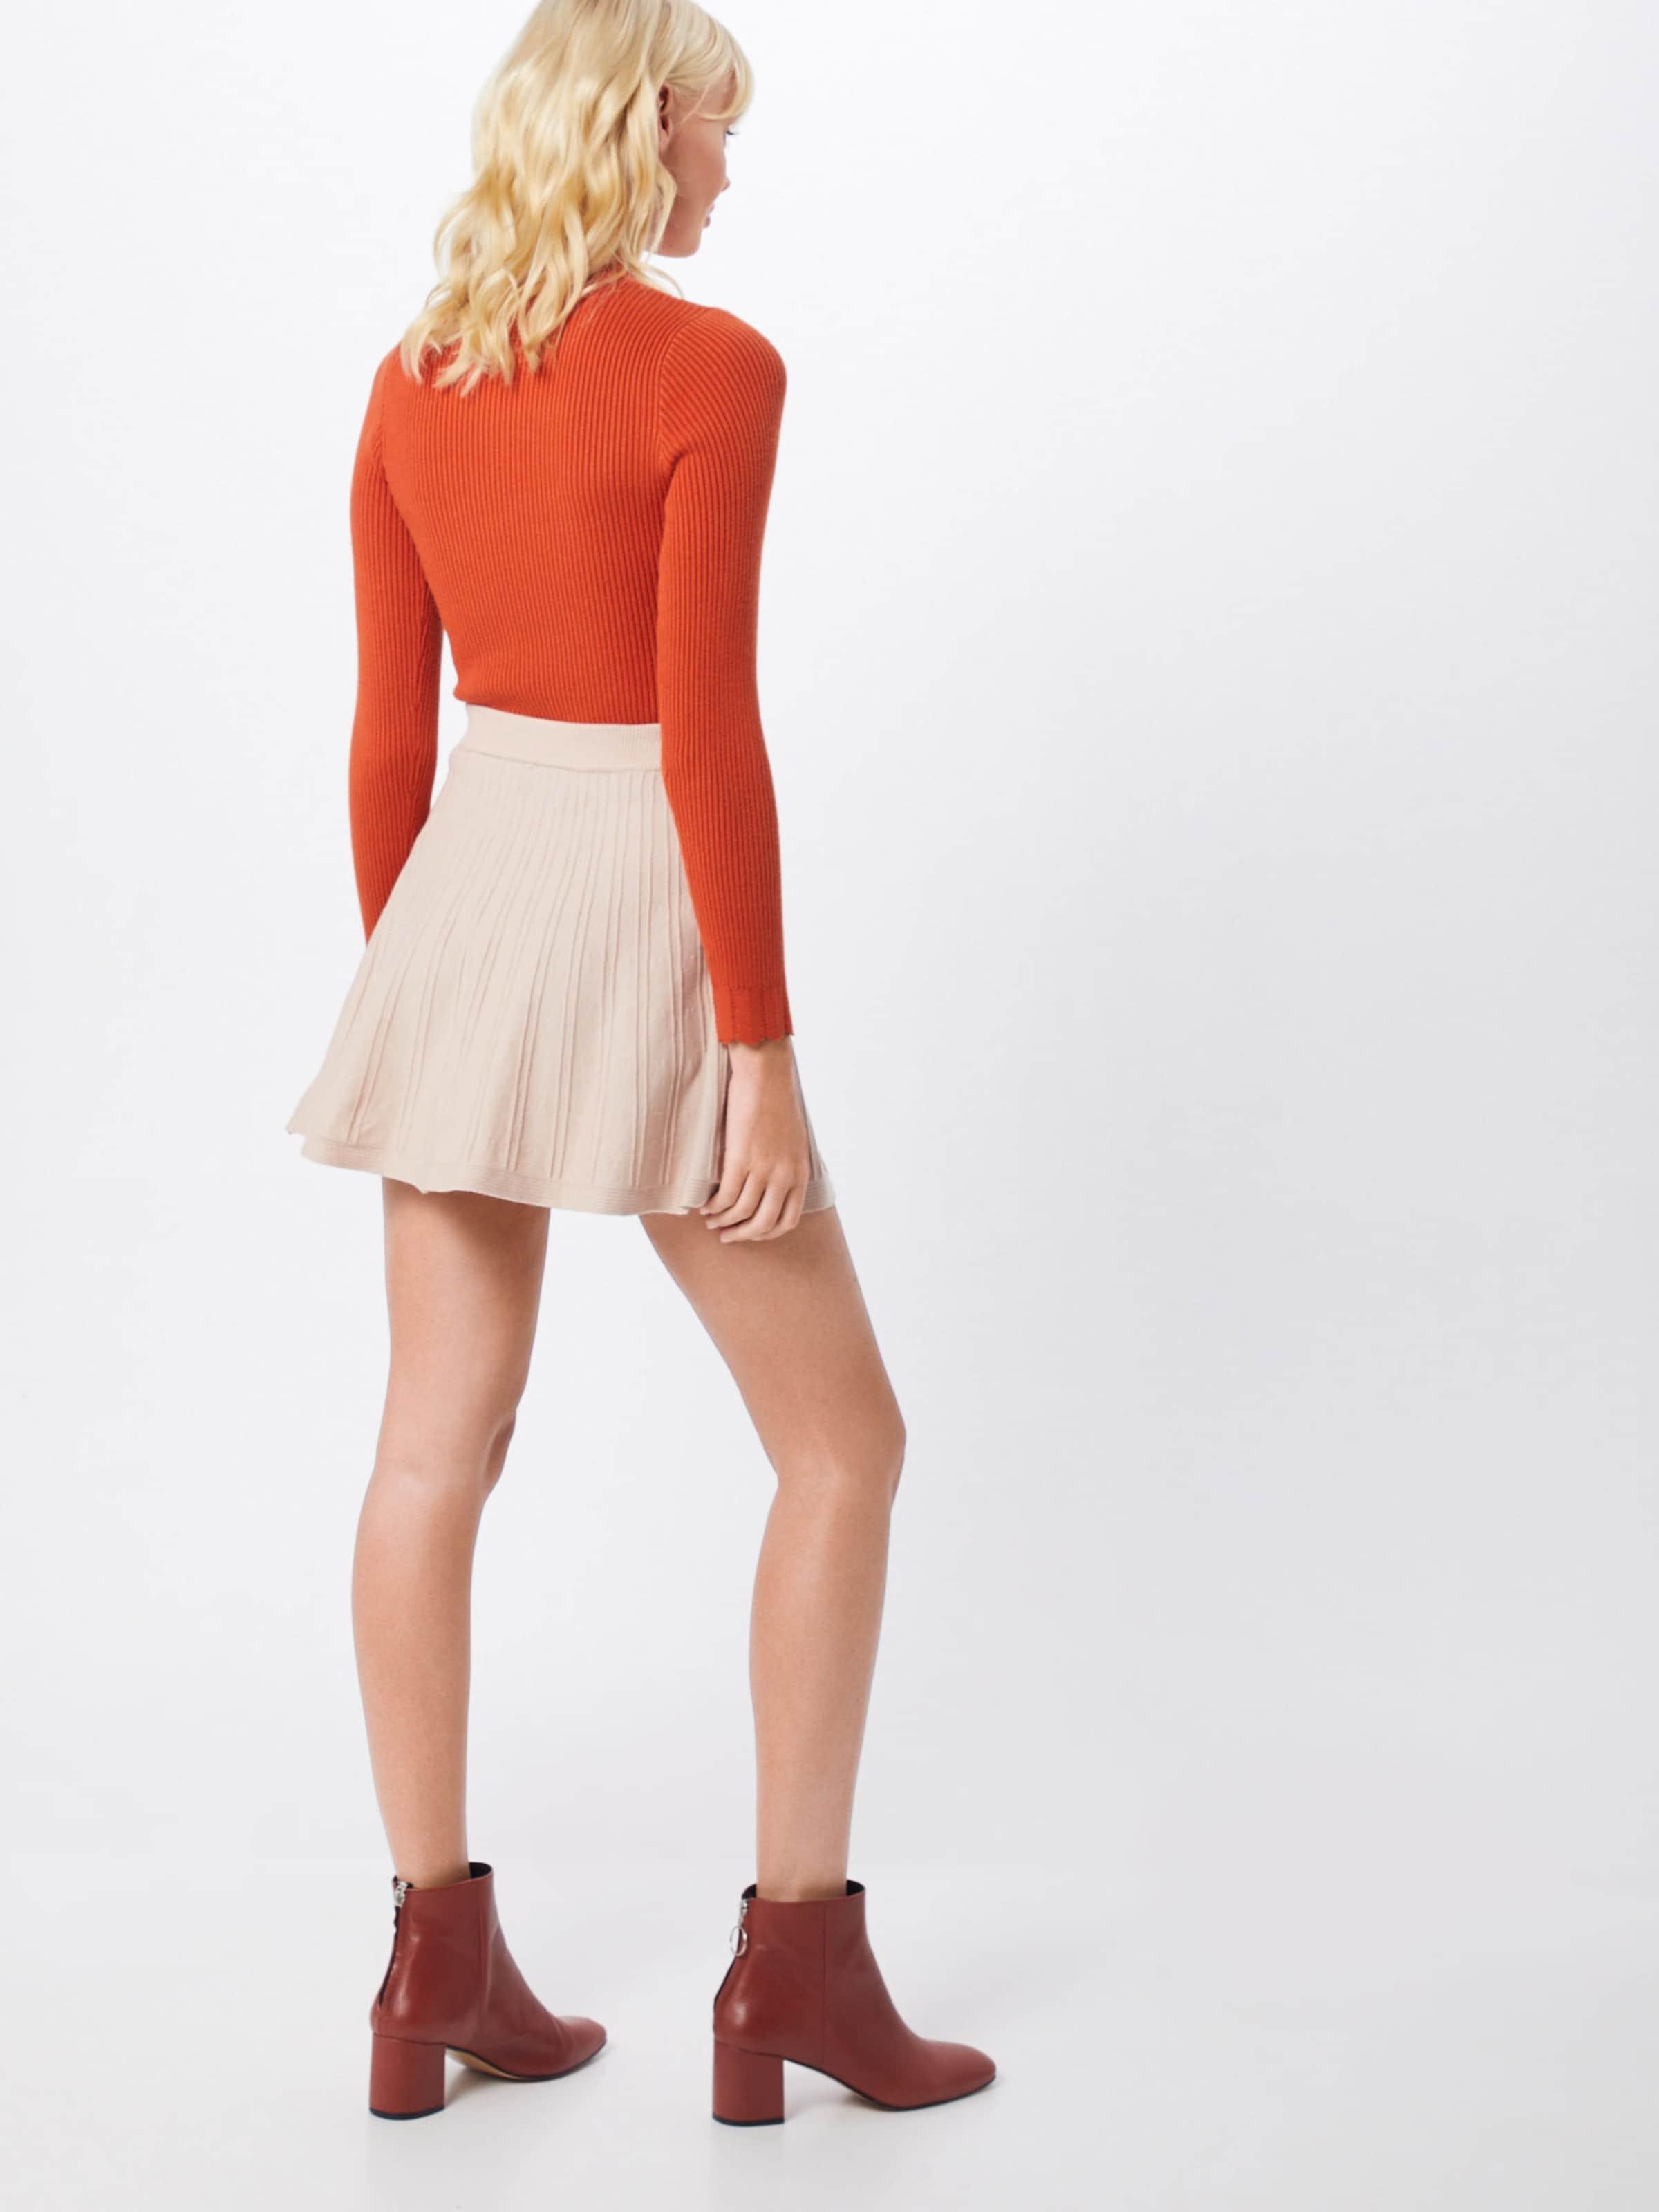 'flipside En Lines Parallel Nude Skirt' Jupe 5A4Lj3R